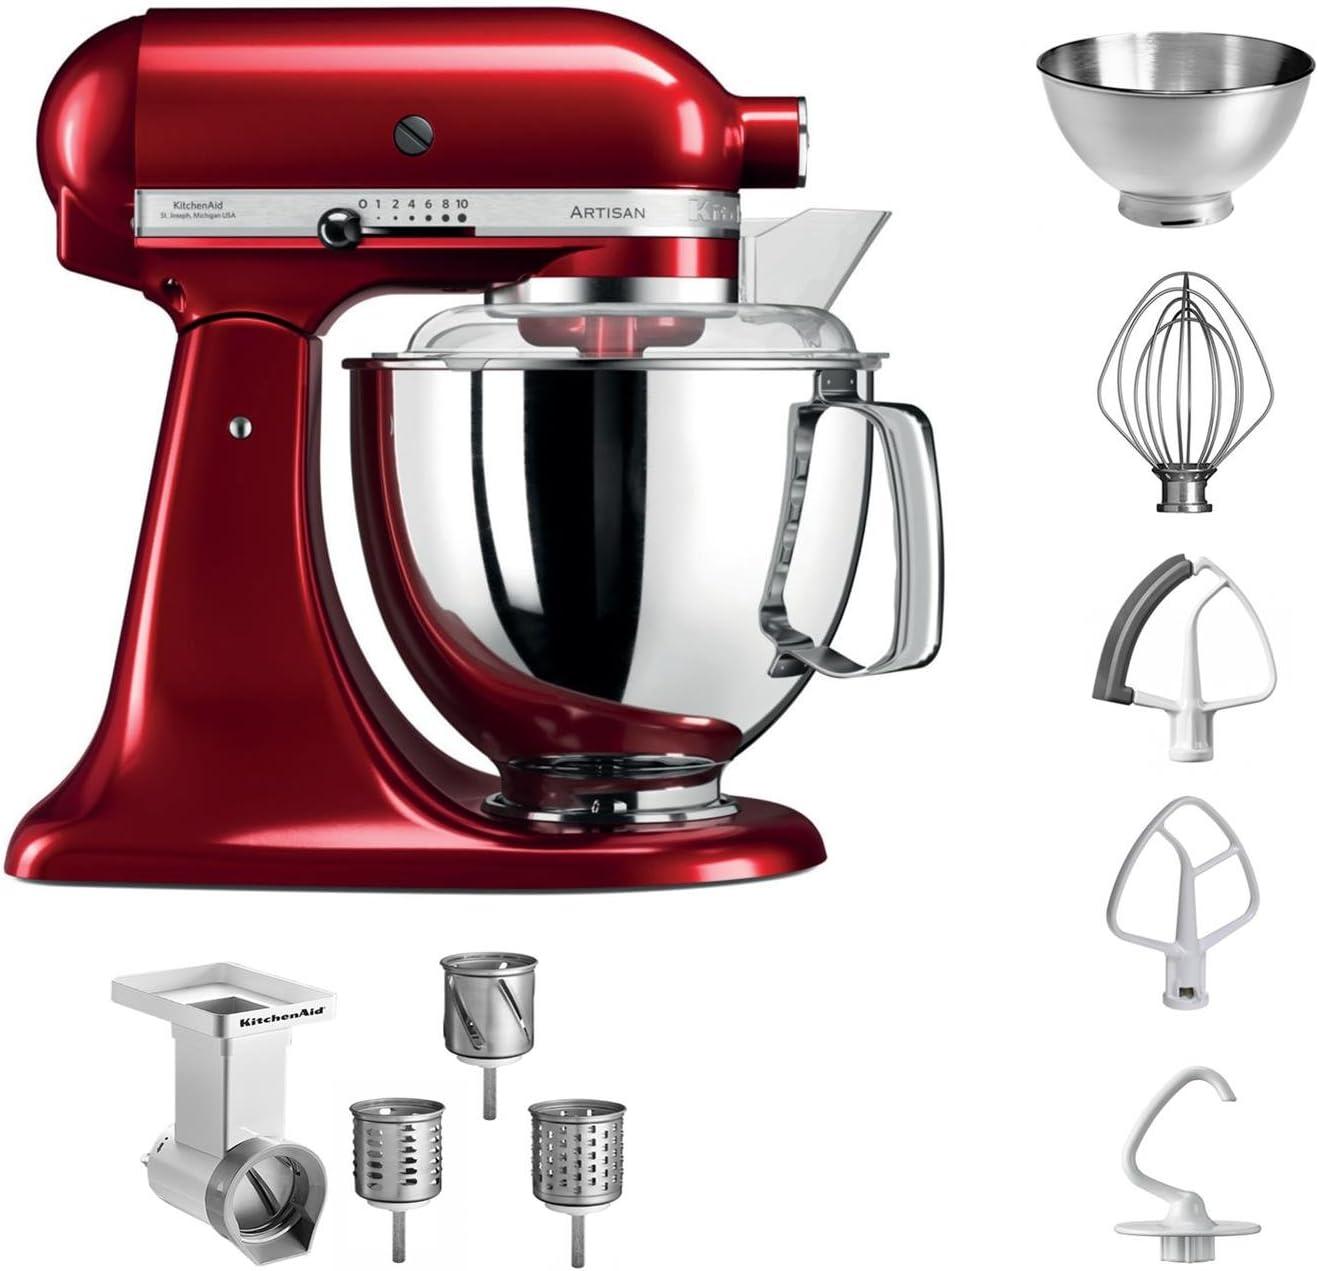 KitchenAid 5 ksm175pseca + MVSA Artisan Robot de cocina + Cortador de verduras, color rojo: Amazon.es: Hogar